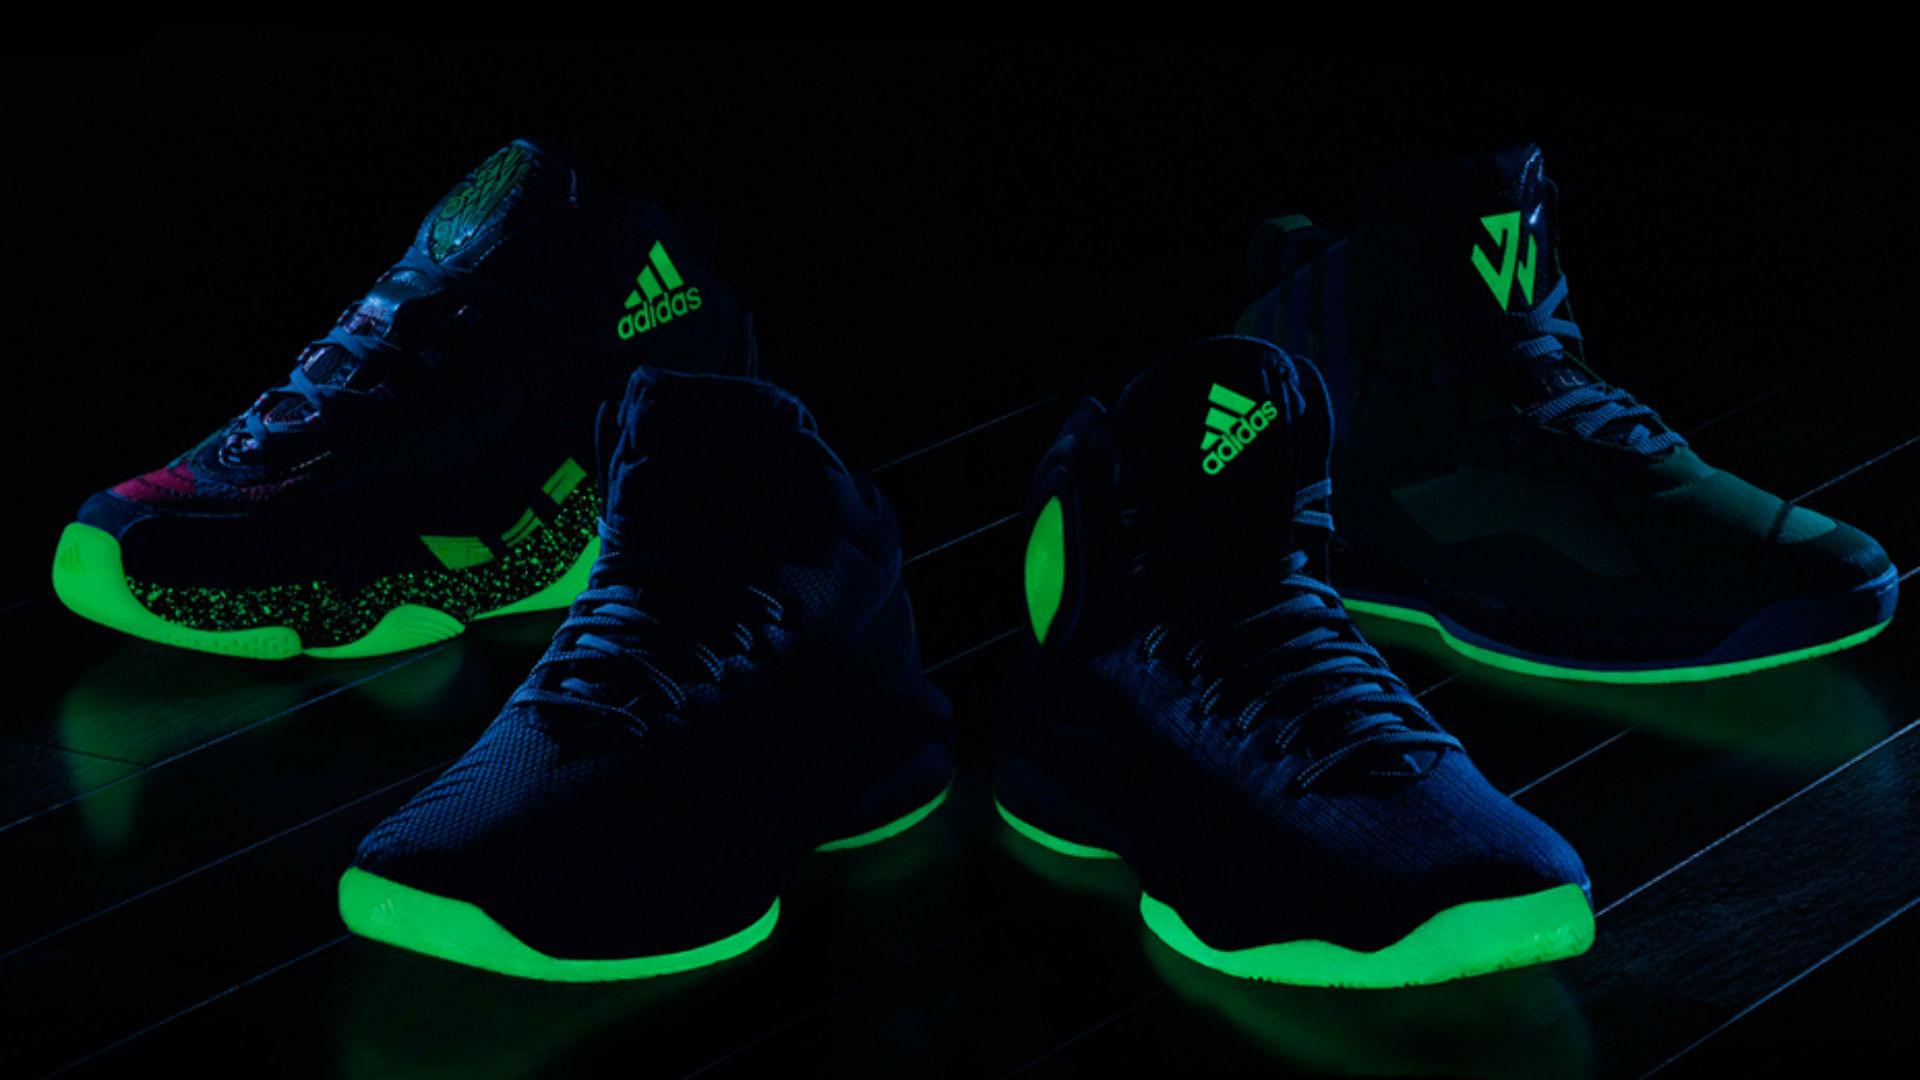 Adidas Crazylight Boost 'Bad Dreams' | Kickspotting